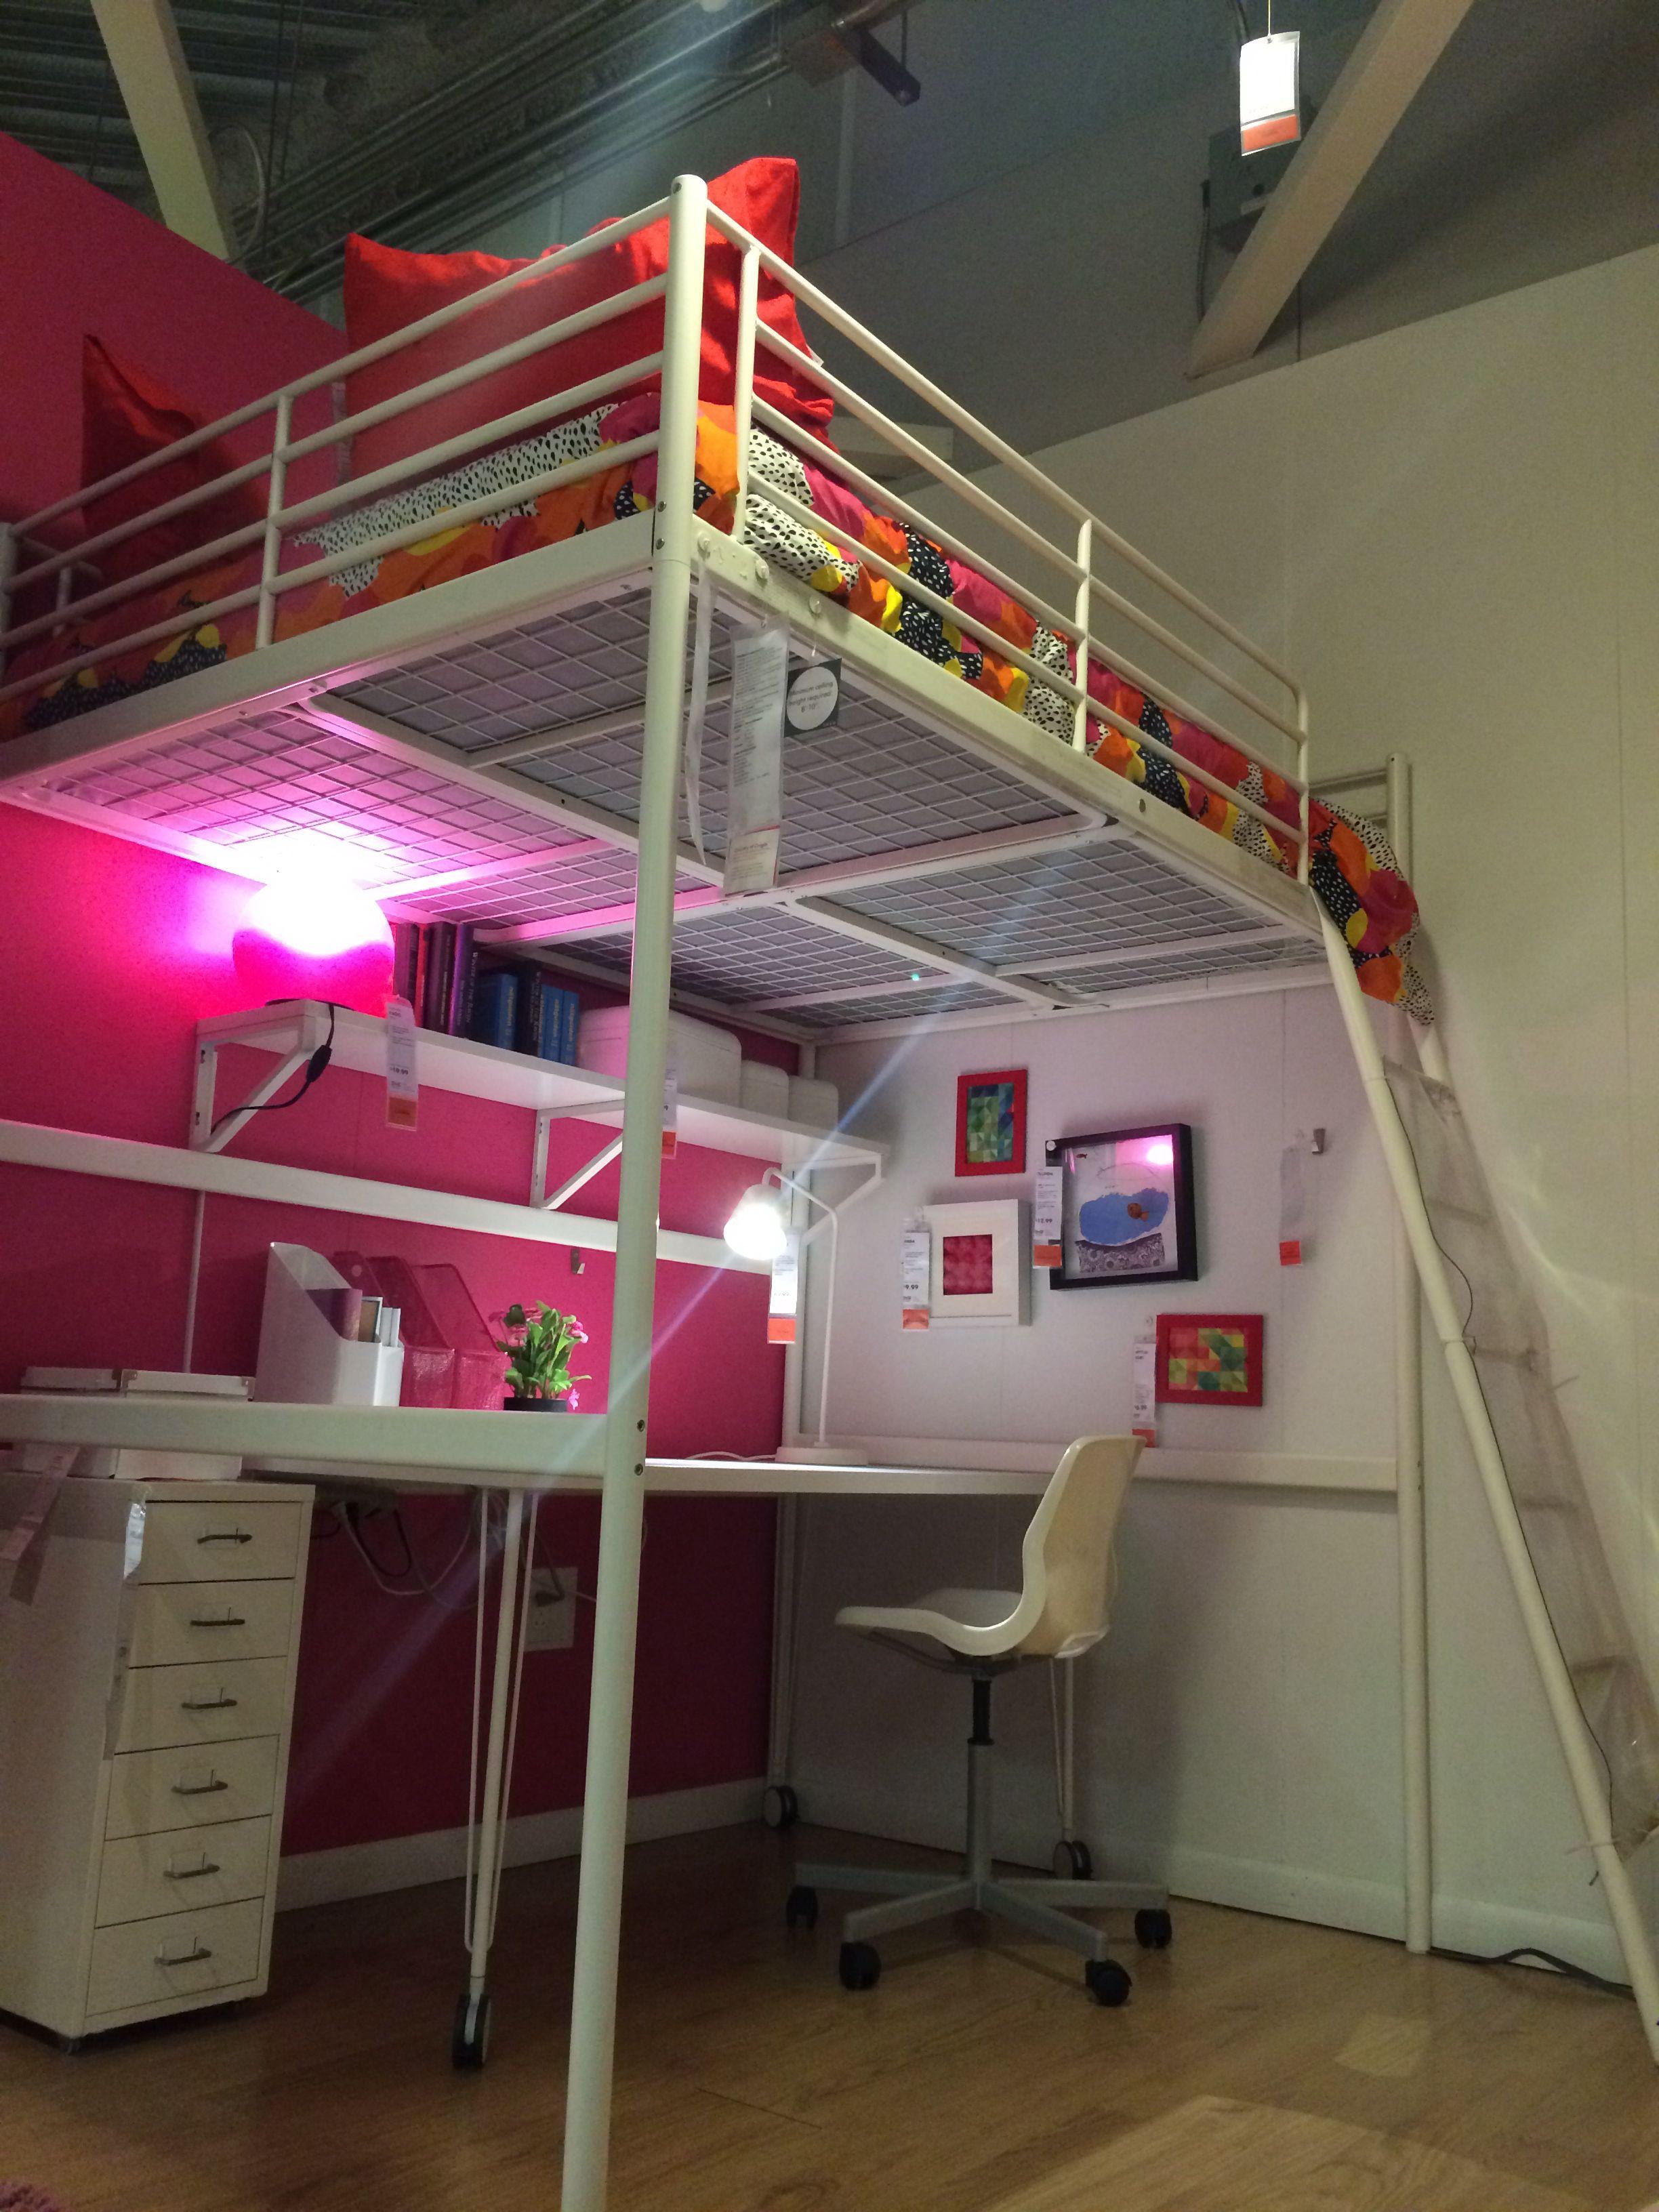 Letto A Castello Tromso Ikea.Tromso Bed At Ikea Big Girl Bedrooms Fancy Bedroom Girls Loft Bed